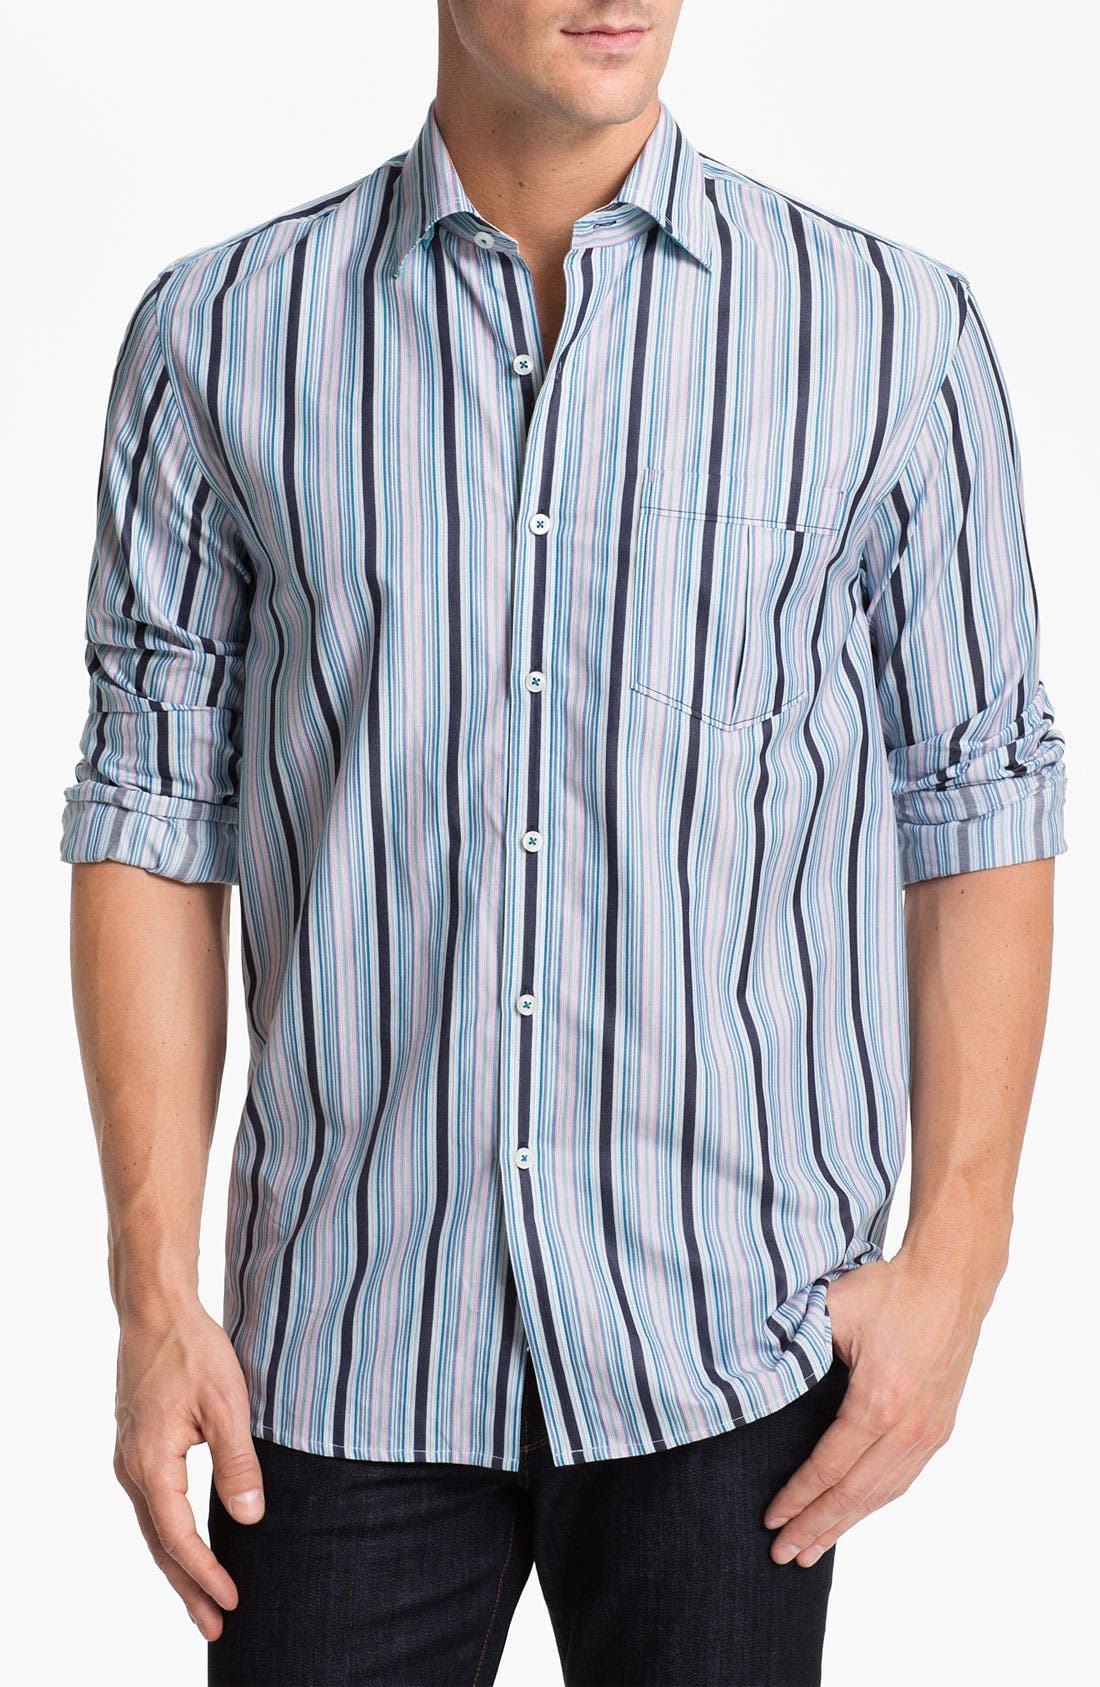 Alternate Image 1 Selected - Tommy Bahama 'Stripe del Sol' Sport Shirt